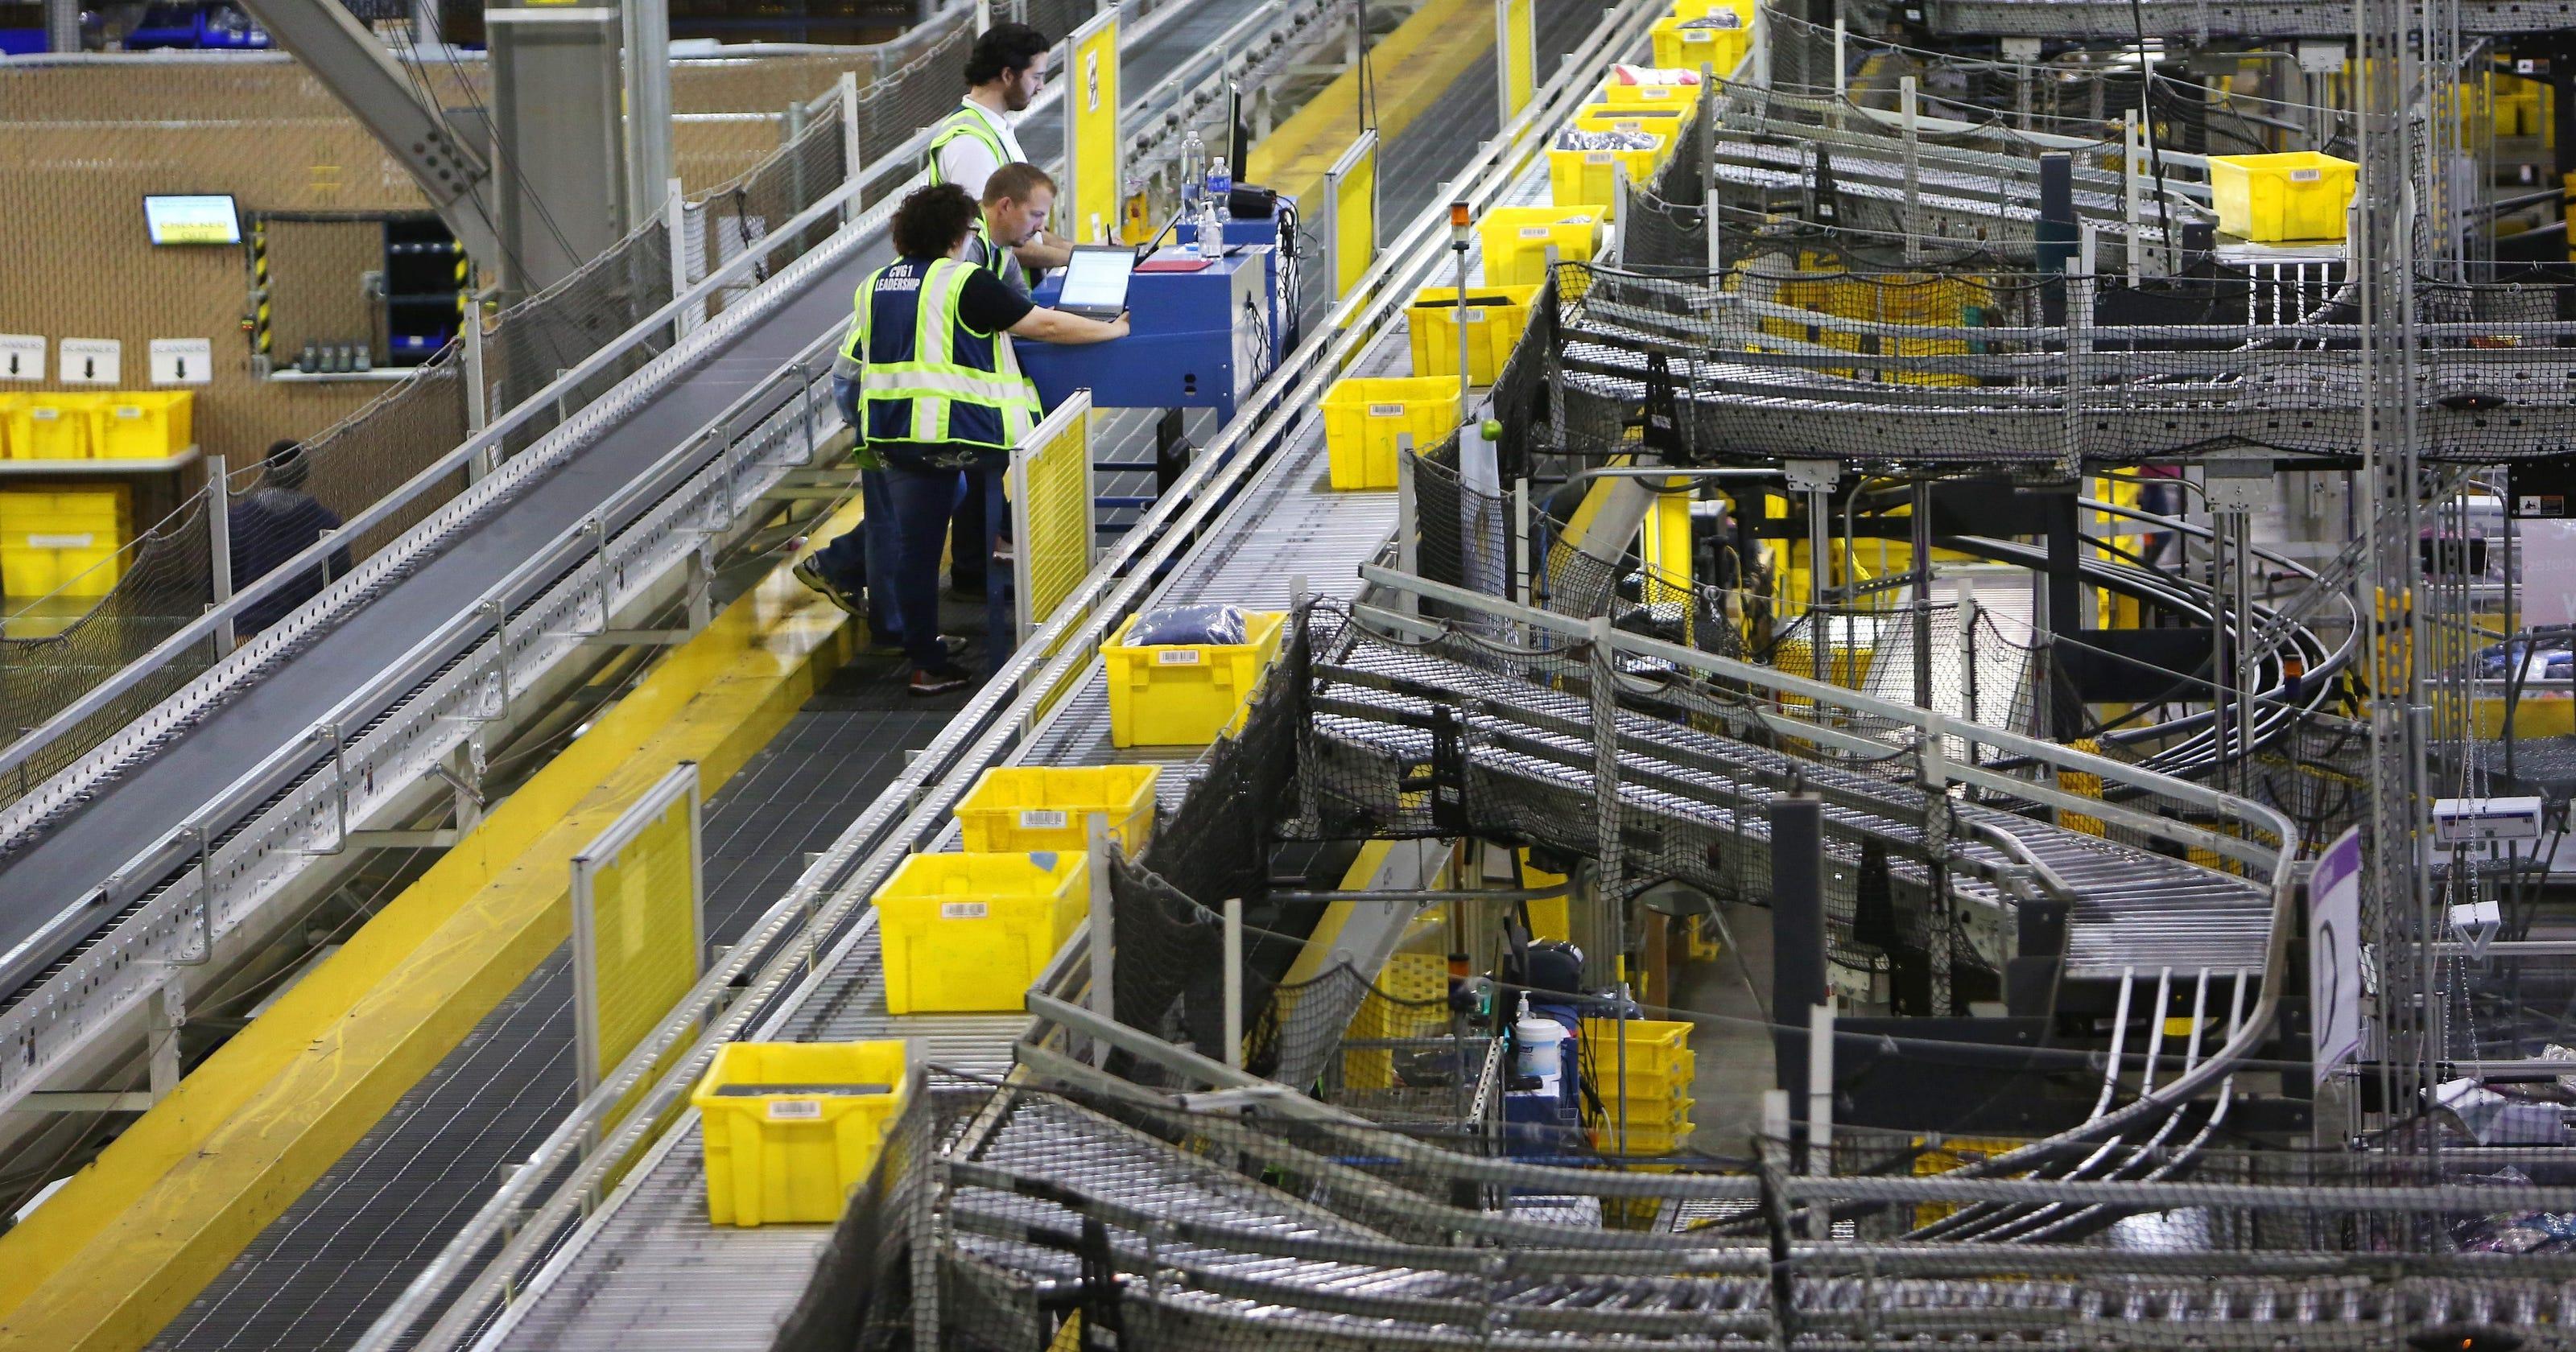 amazon plans worldwide cargo hub 2 700 jobs at cvg